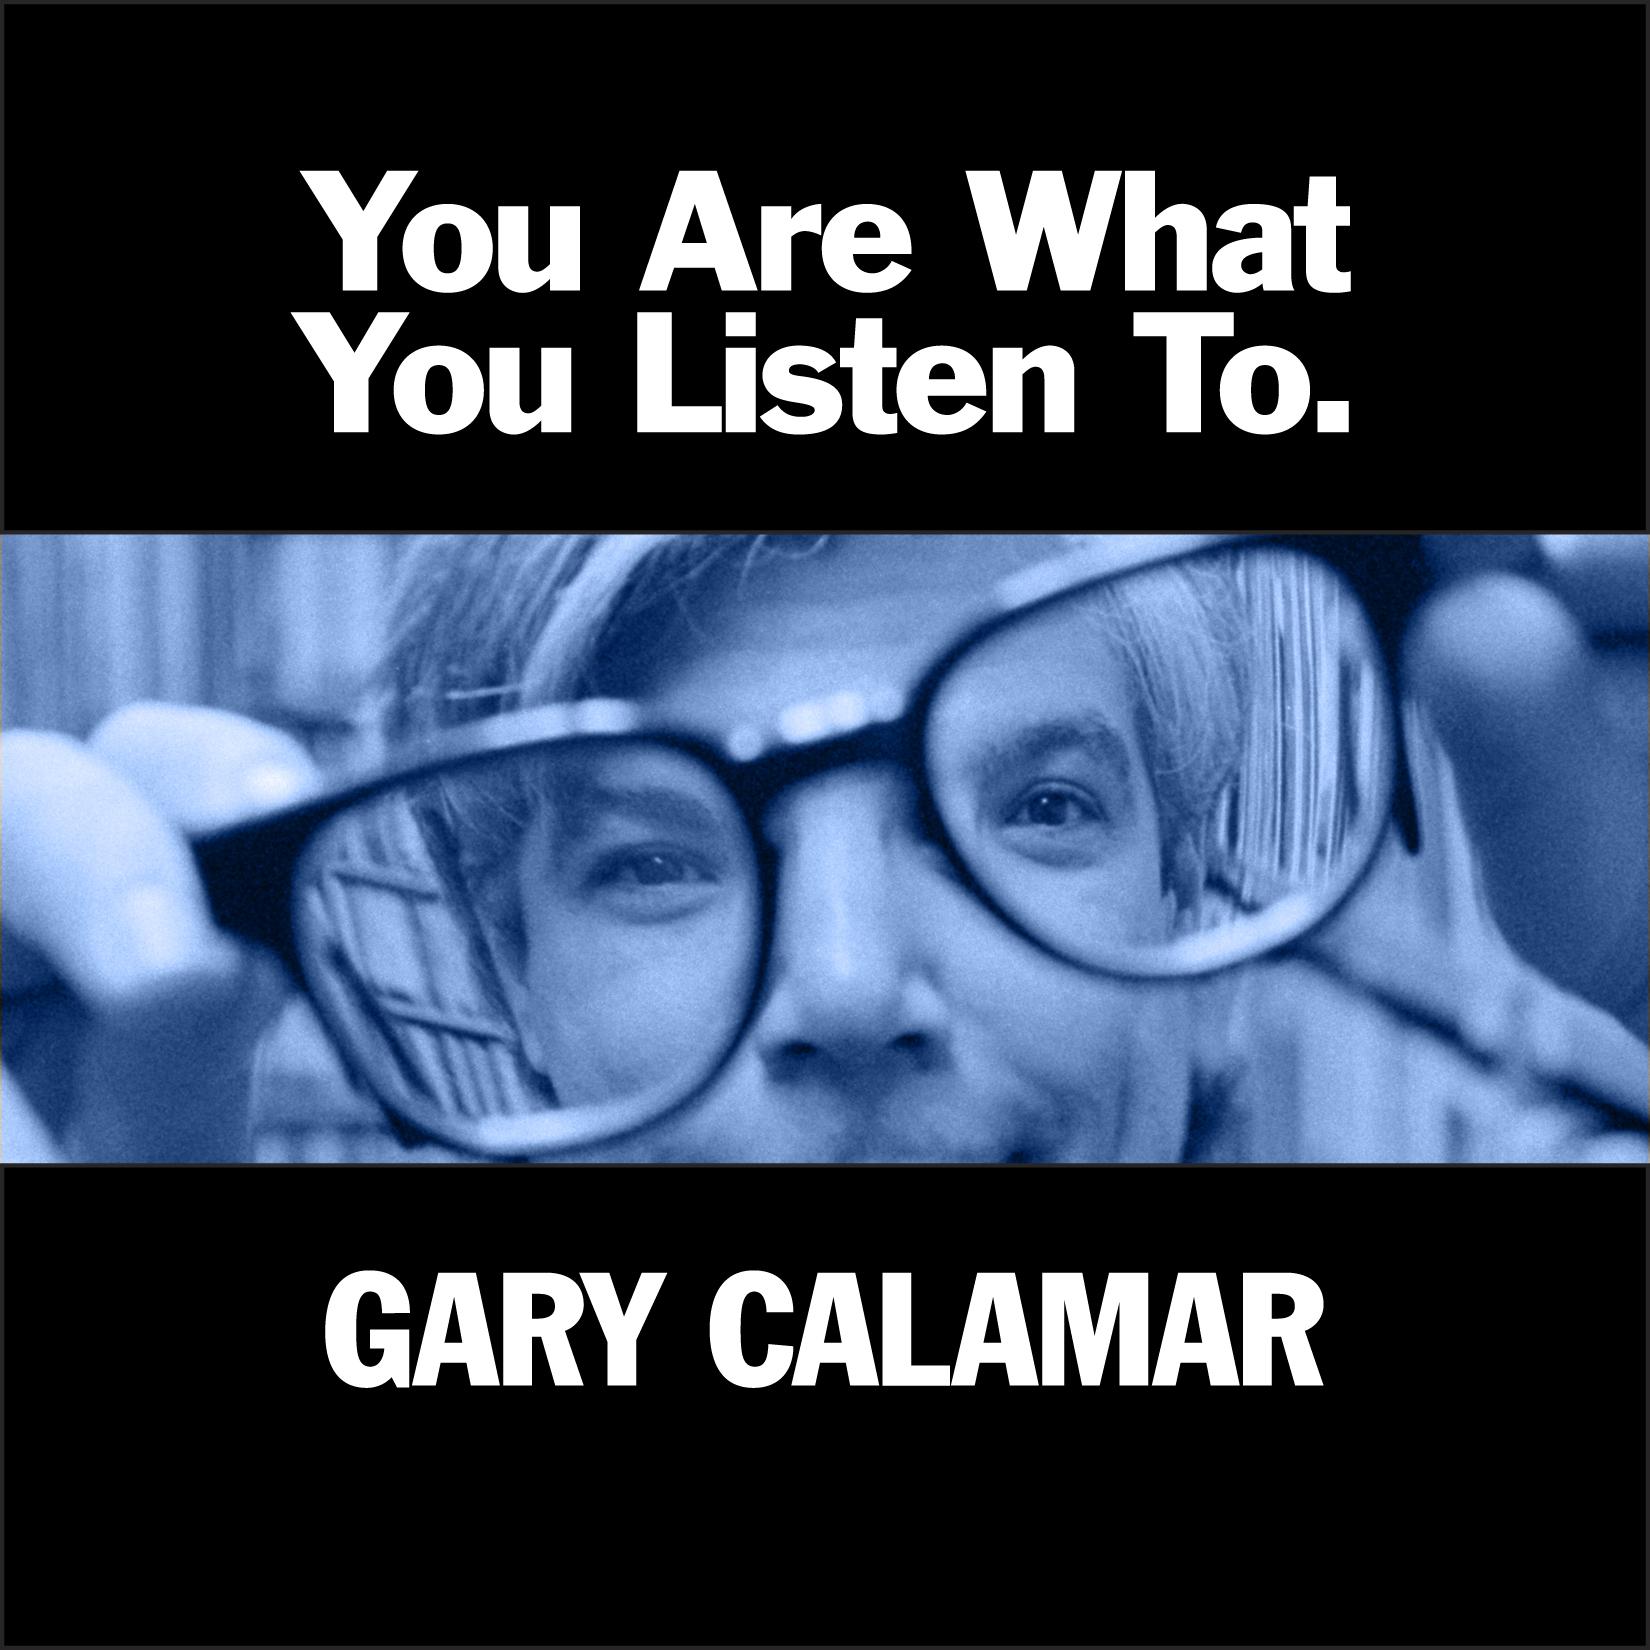 MUSIC NEWS REMINDER: GARY CALAMAR'S ATLANTIC RECORDS DEBUT OUT TODAY!